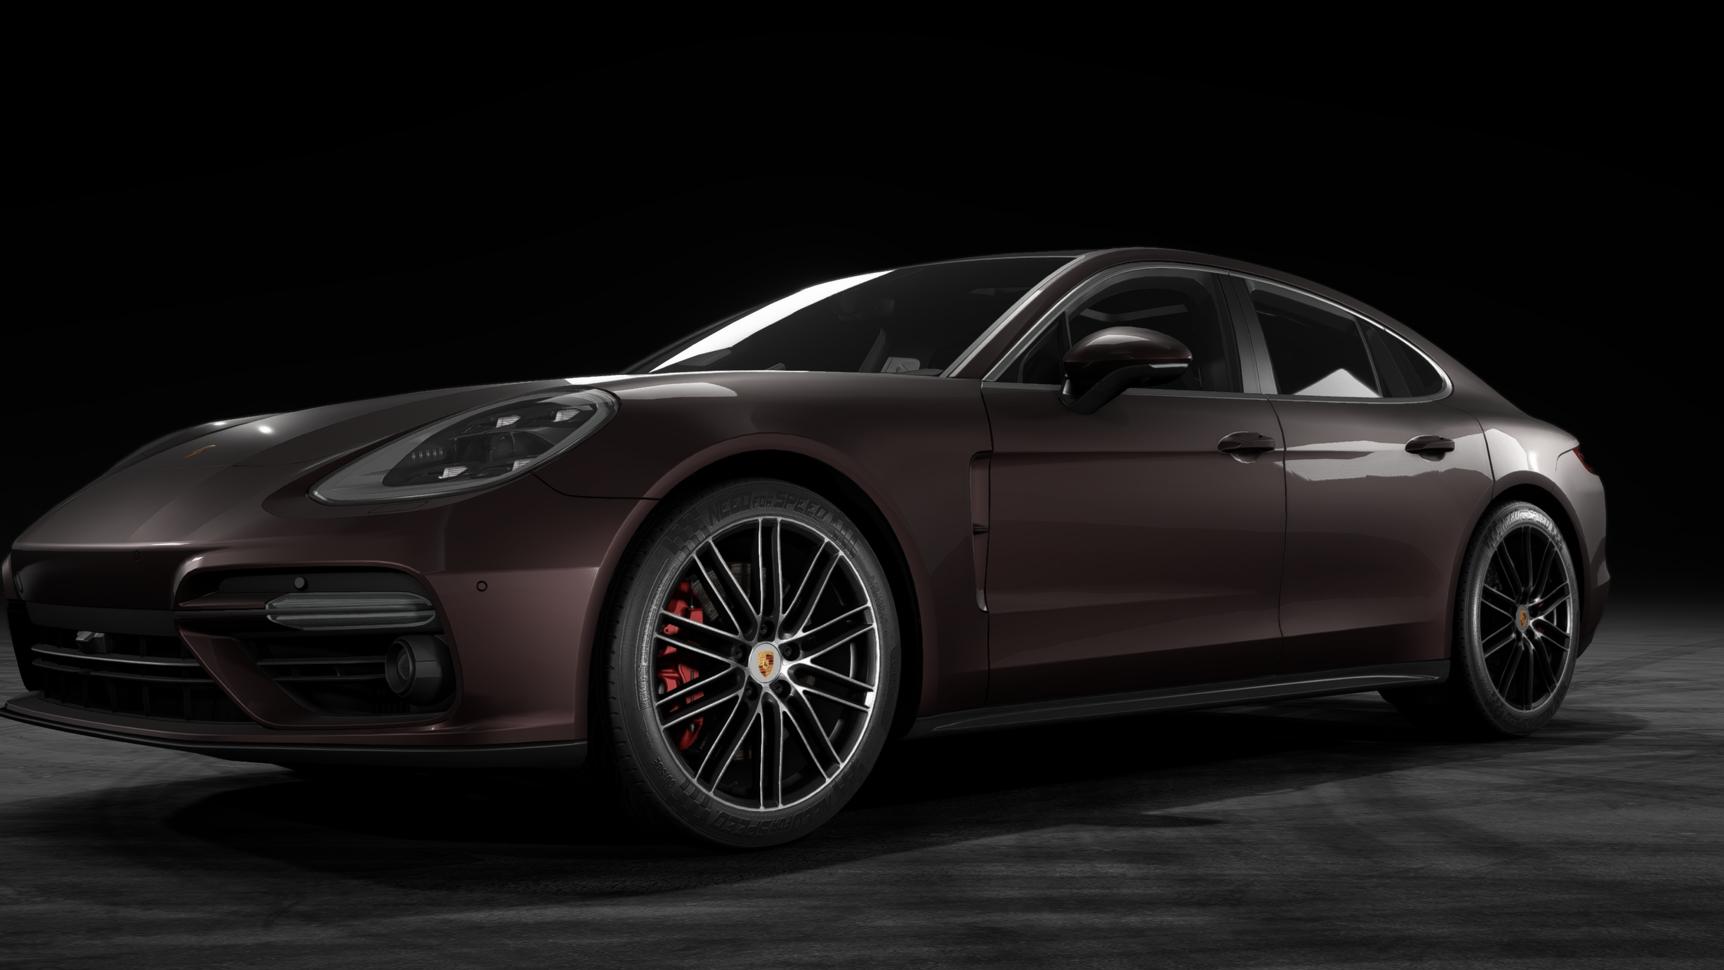 Porsche Panamera Turbo 971 Need For Speed Wiki Fandom